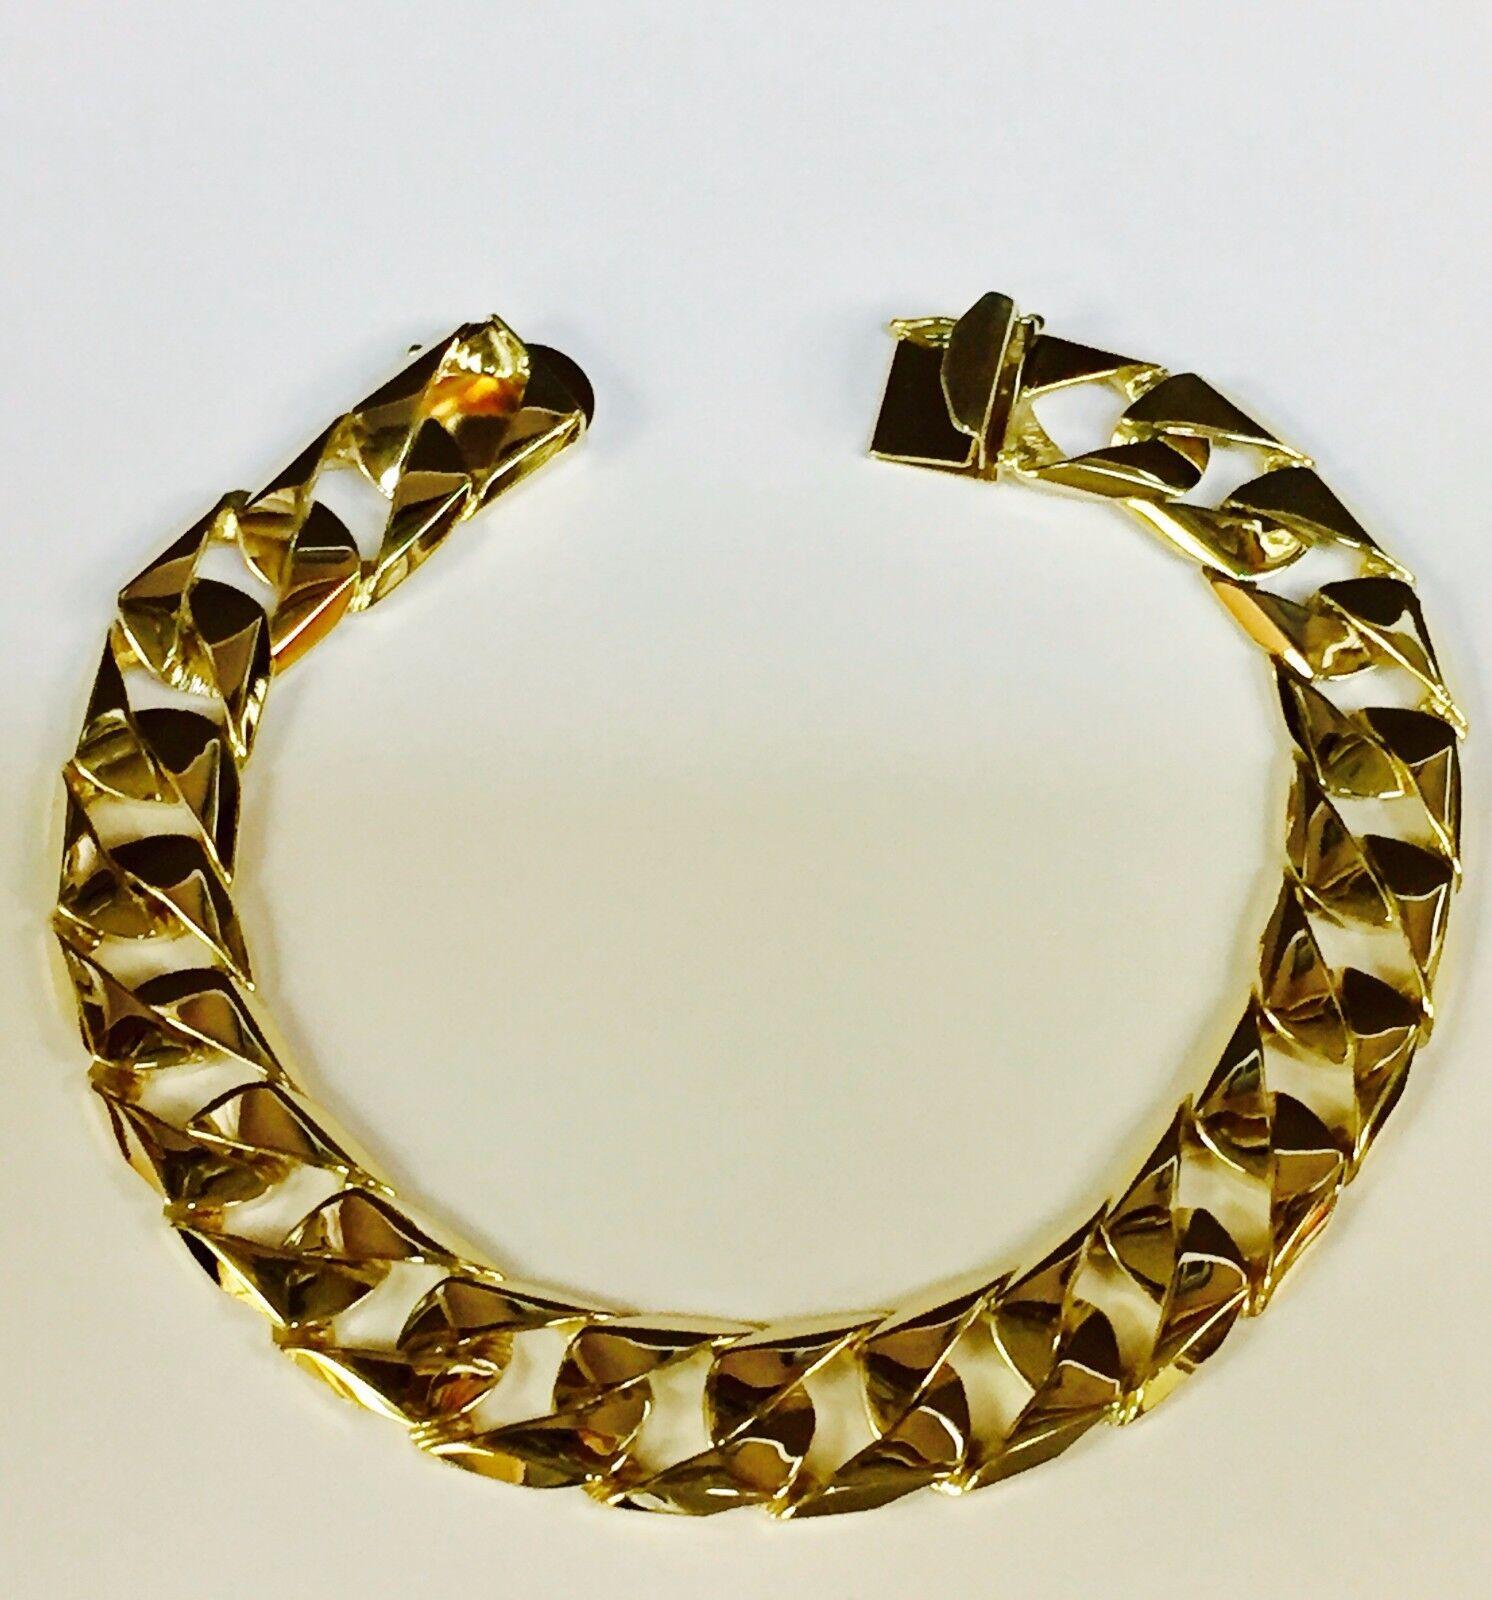 14kt Solid Yellow gold Handmade Curb Link Mens Bracelet 9.5  53 Grams 14MM